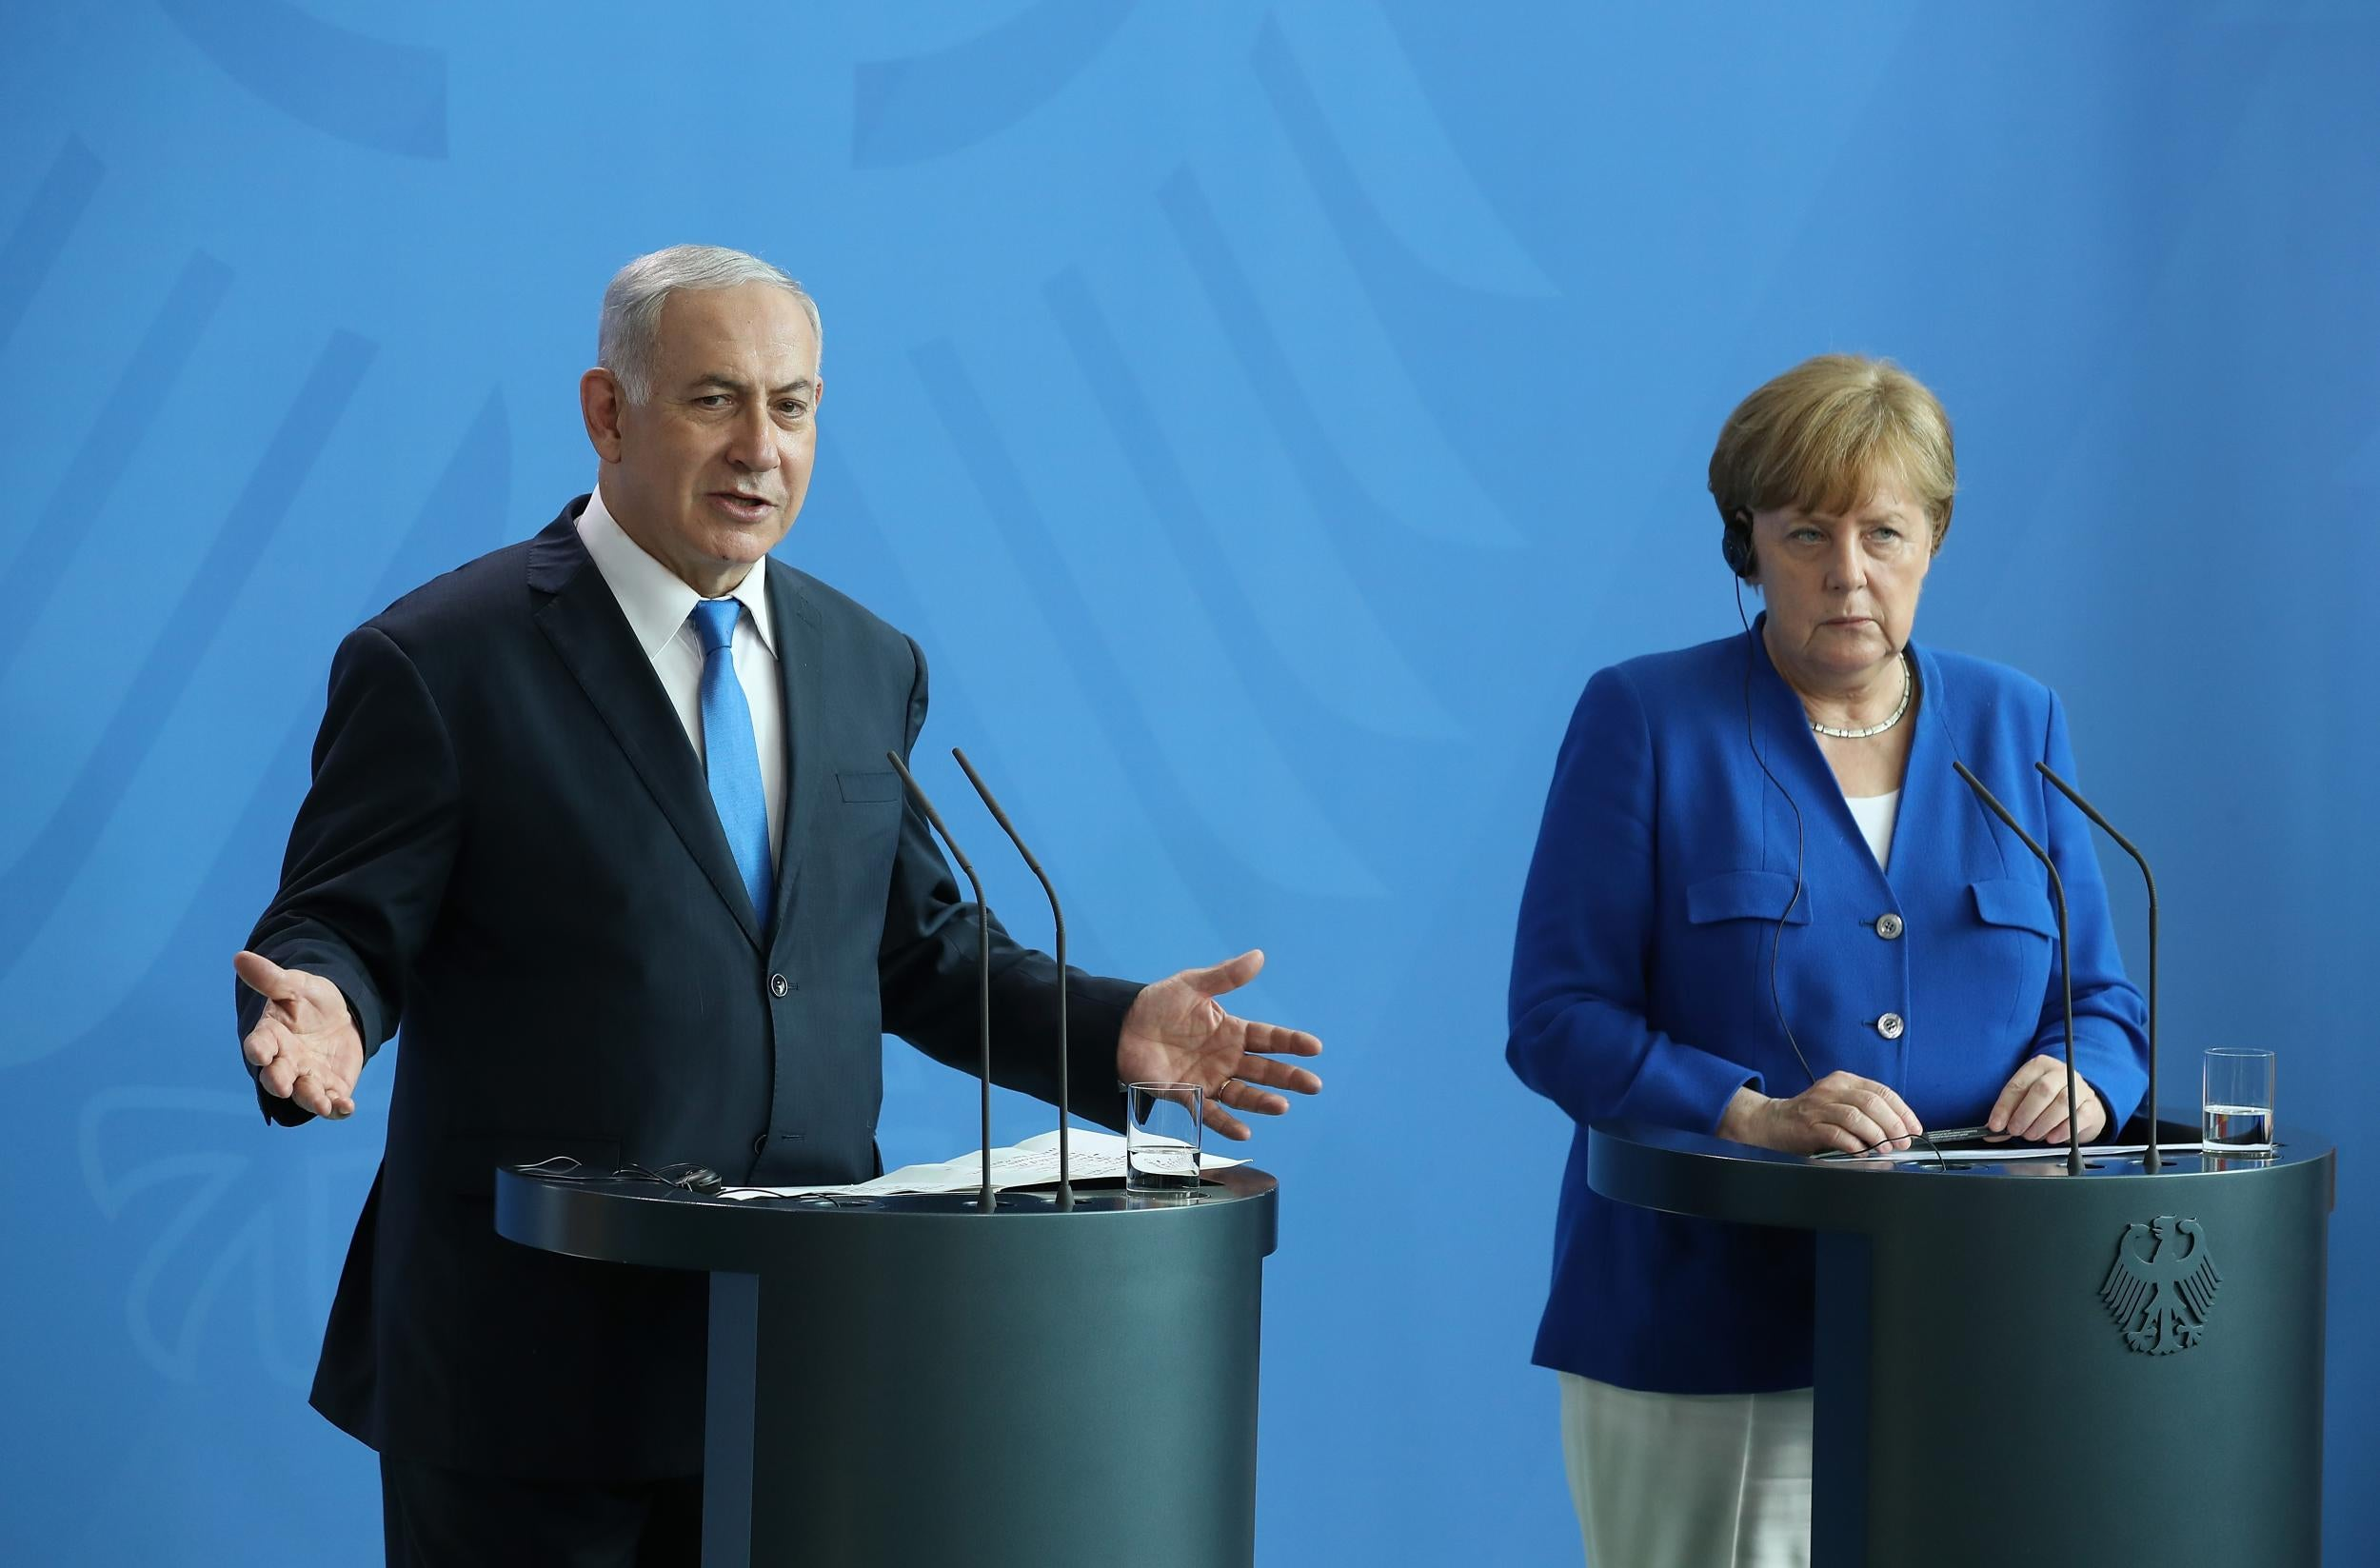 Israel's Benjamin Netanyahu flies to Europe to lobby May, Macron and Merkel against Iran nuclear deal